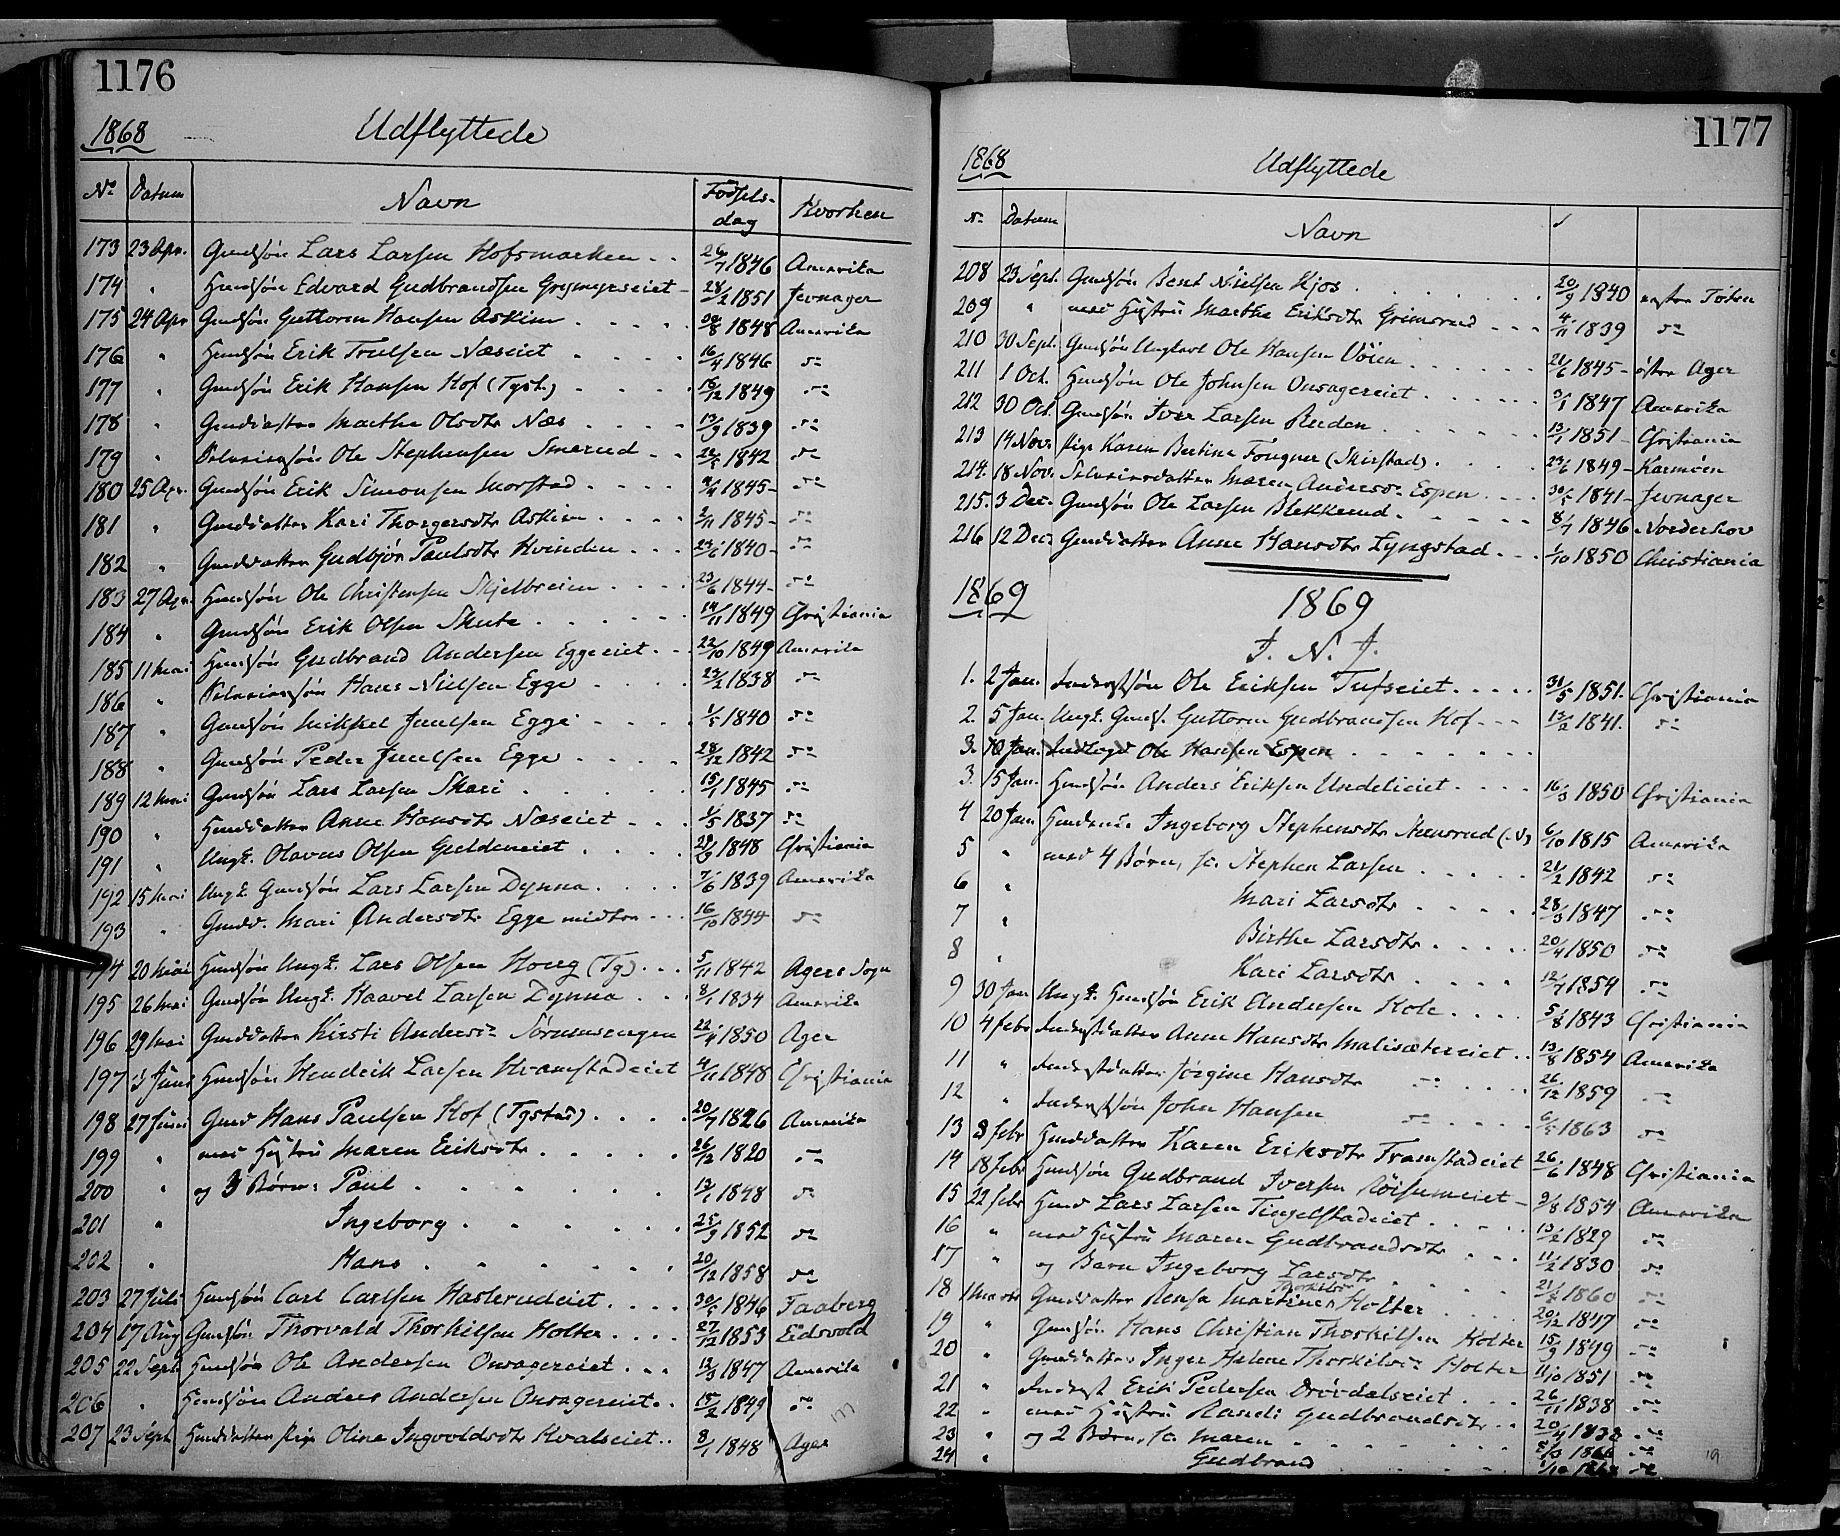 SAH, Gran prestekontor, Ministerialbok nr. 12, 1856-1874, s. 1176-1177